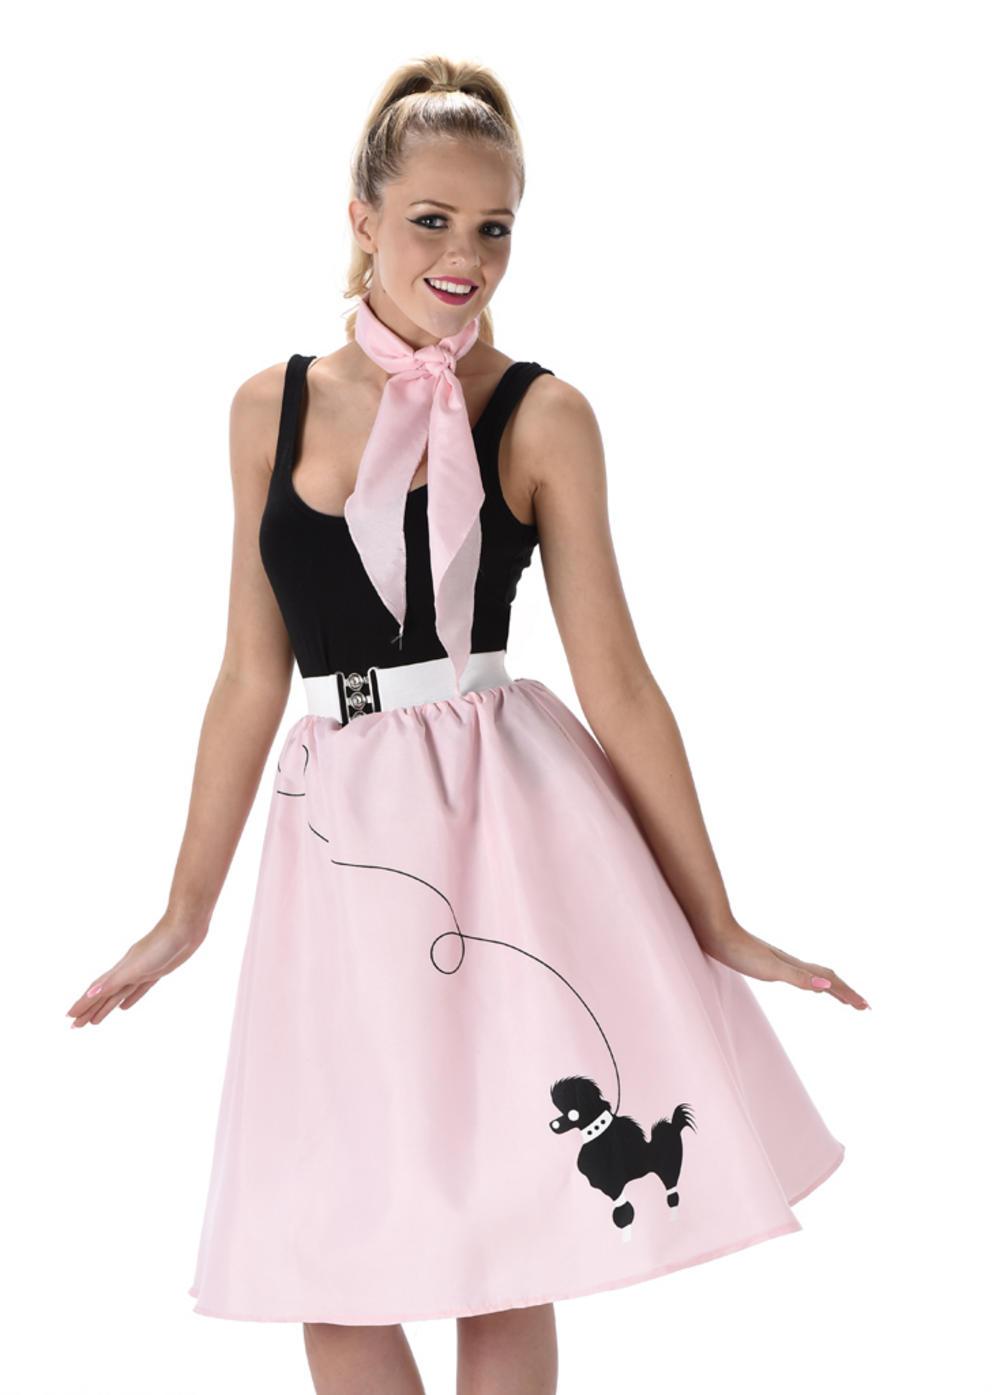 Baby Pink Poodle Skirt Ladies Costume. Baby Pink Poodle Skirt Ladies Costume  sc 1 st  Mega Fancy Dress & Baby Pink Poodle Skirt Ladies Costume | All Ladies Costumes | Mega ...